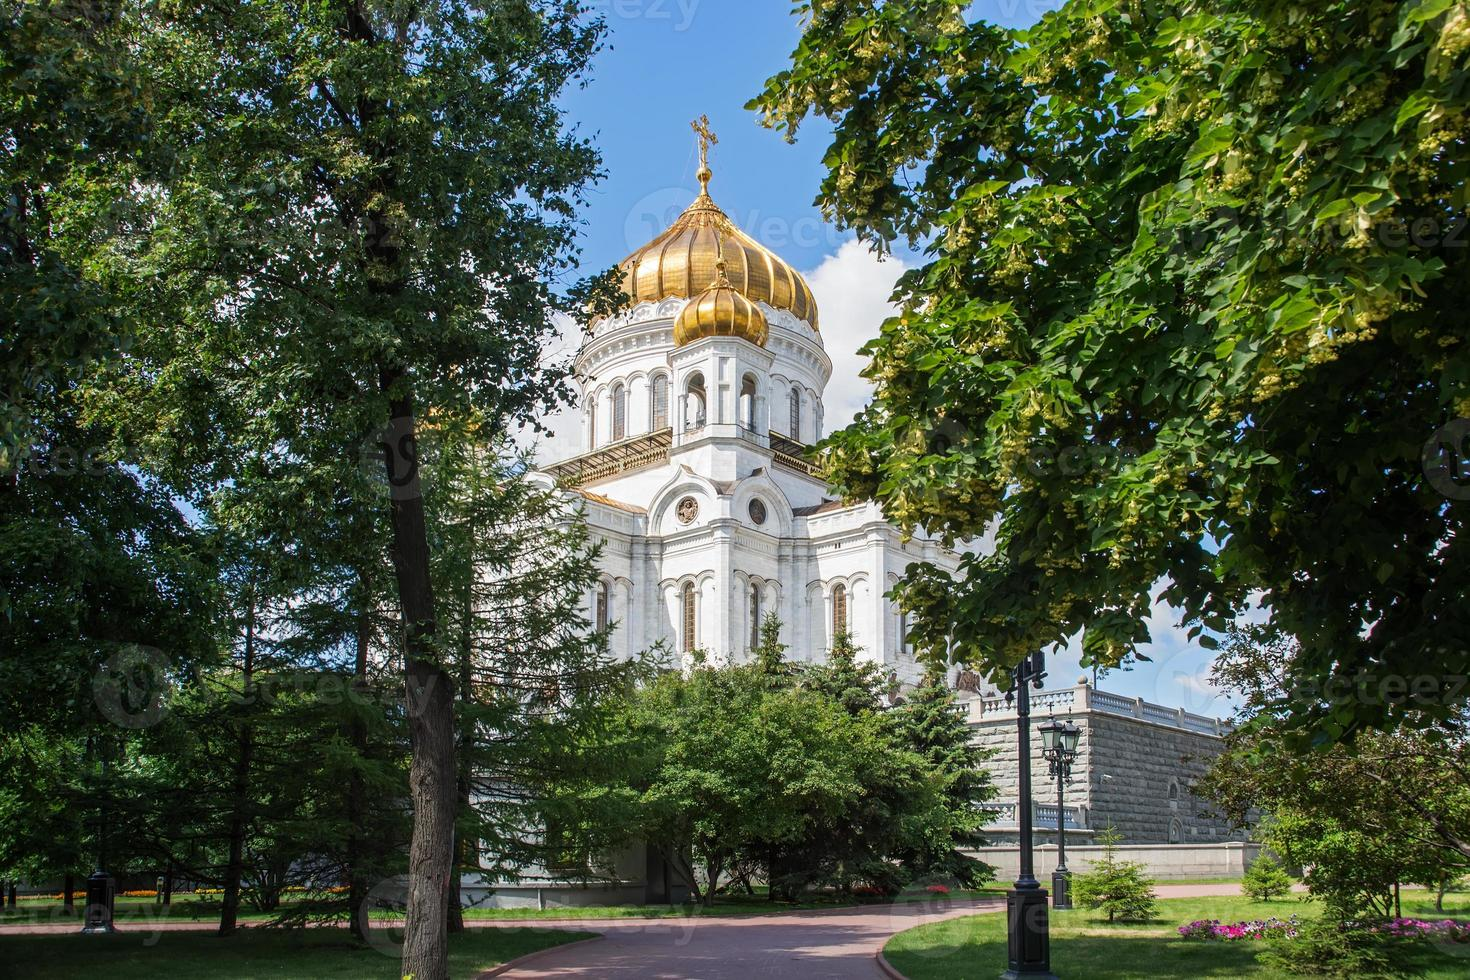 kathedraal van Christus de Verlosser, Moskou, Rusland foto